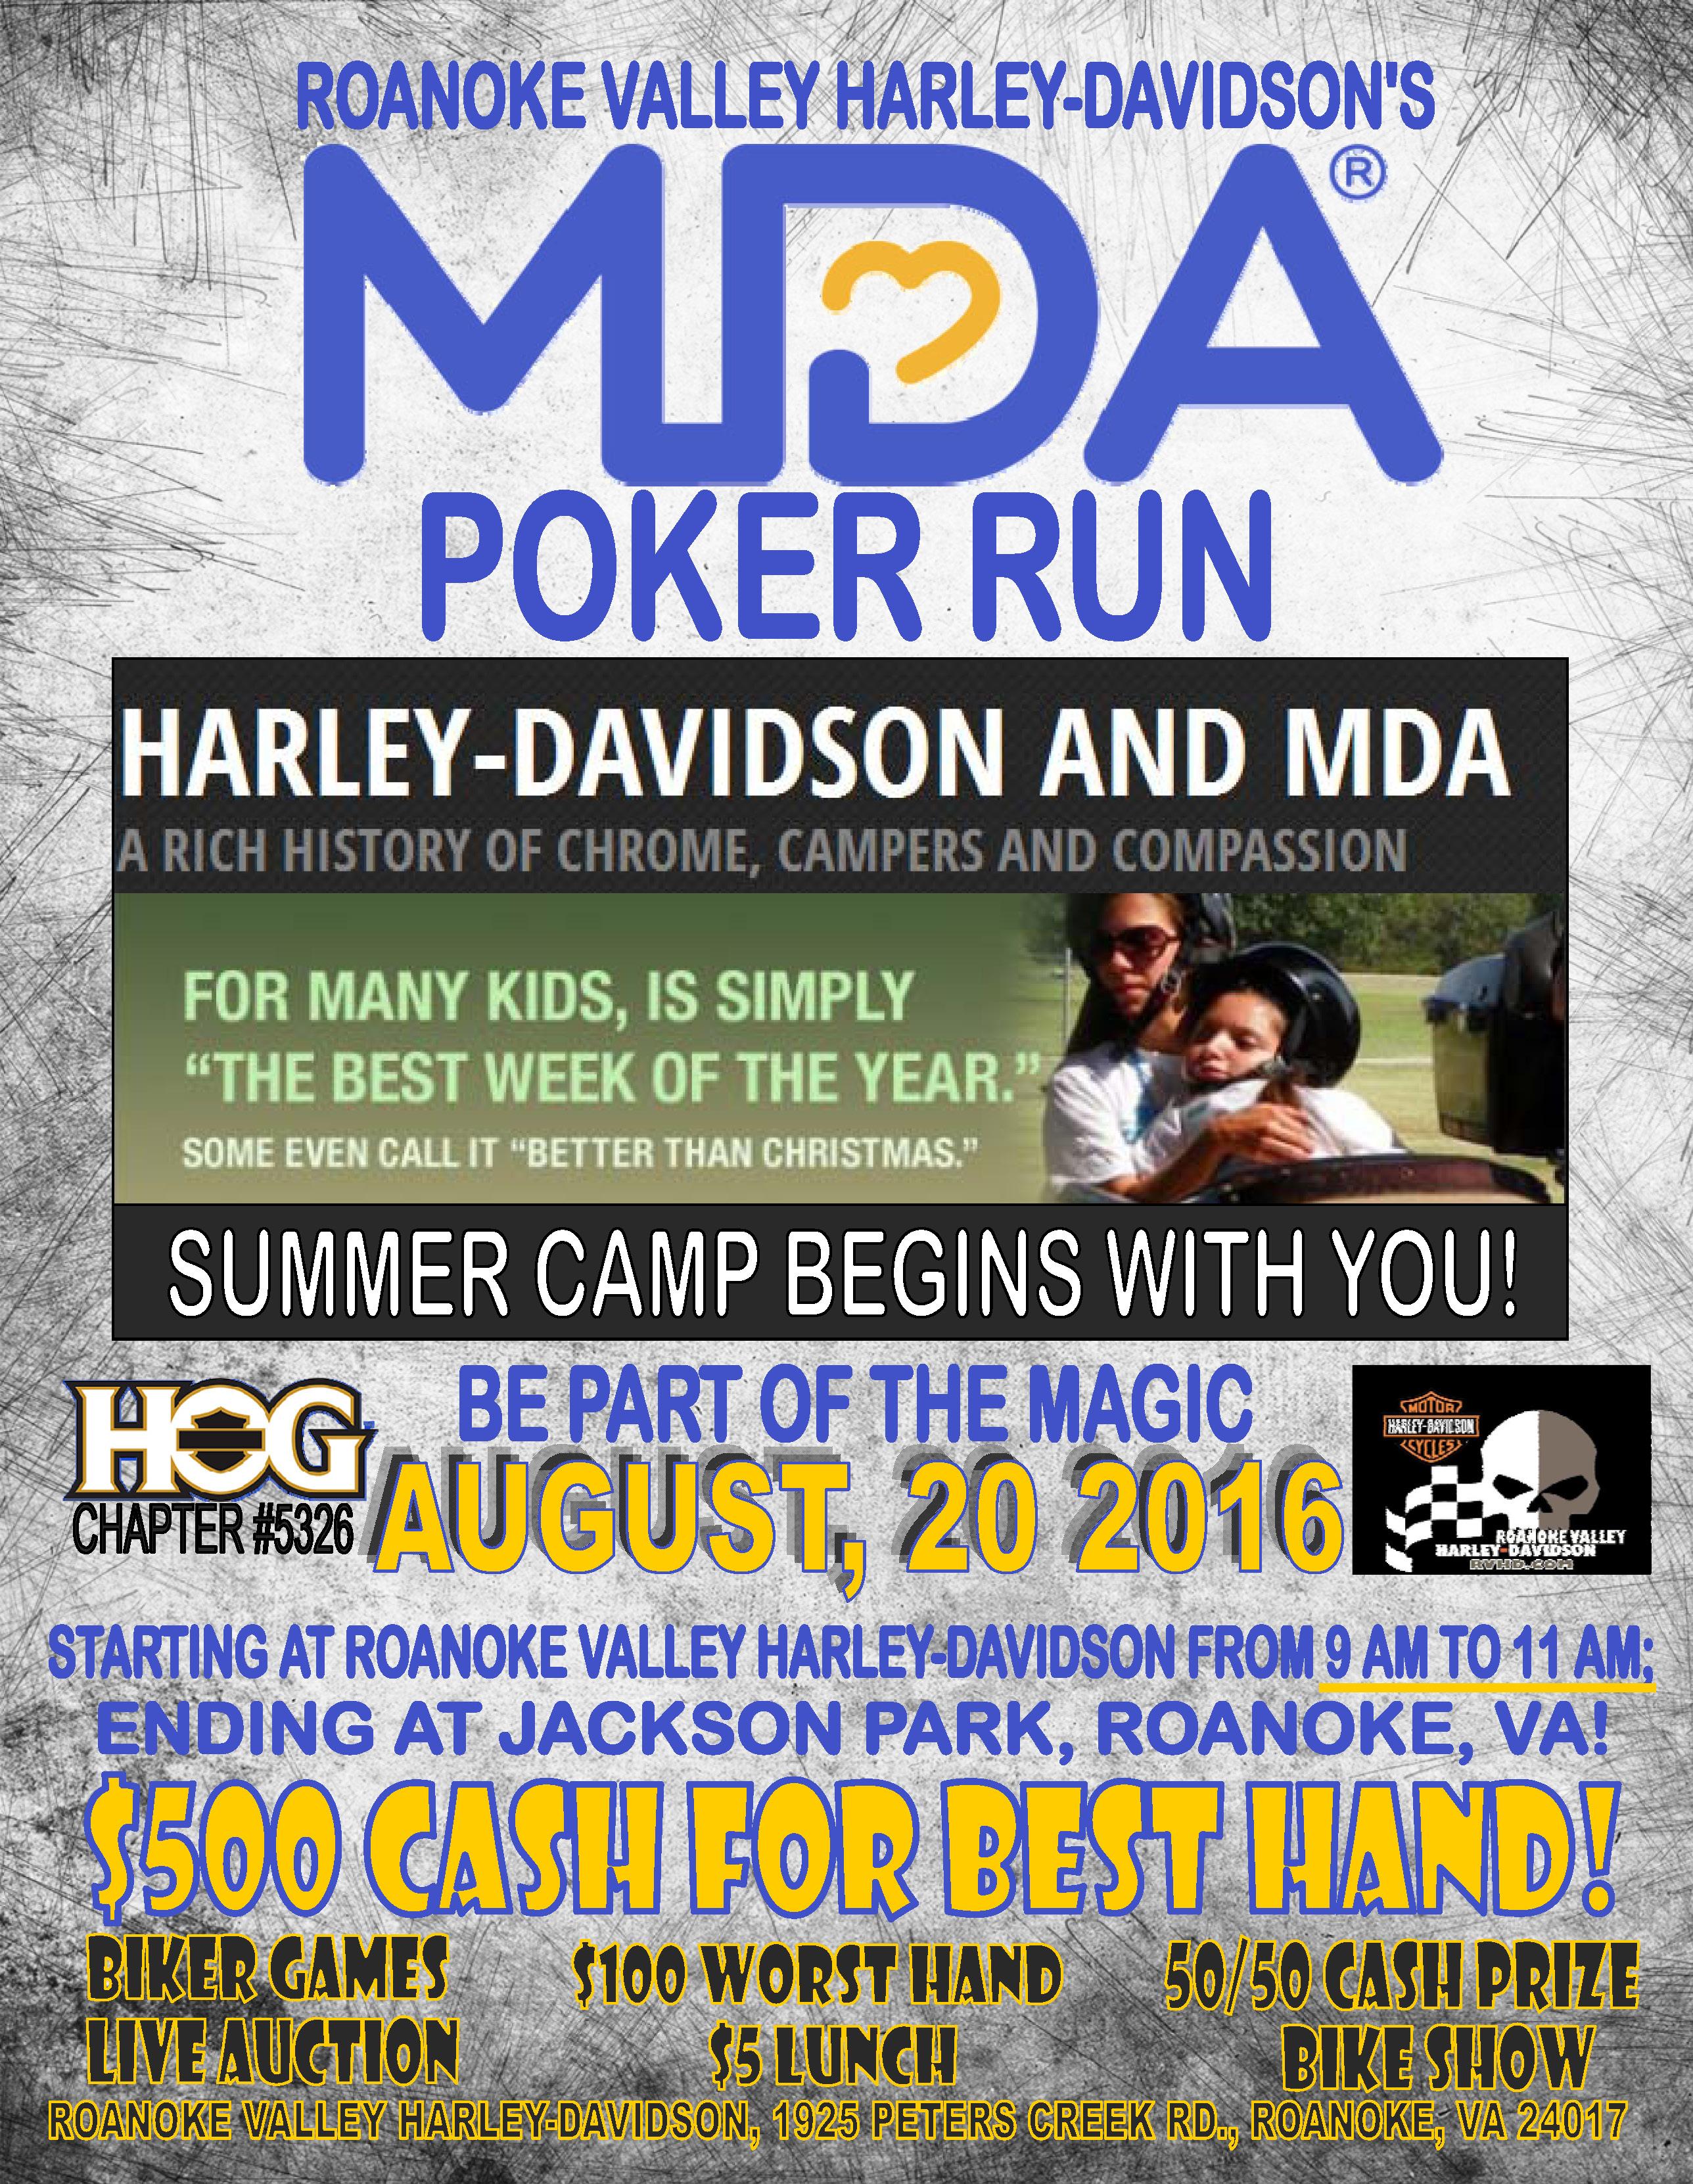 roanoke valley harley-davidson mda poker run - motorcycle event in